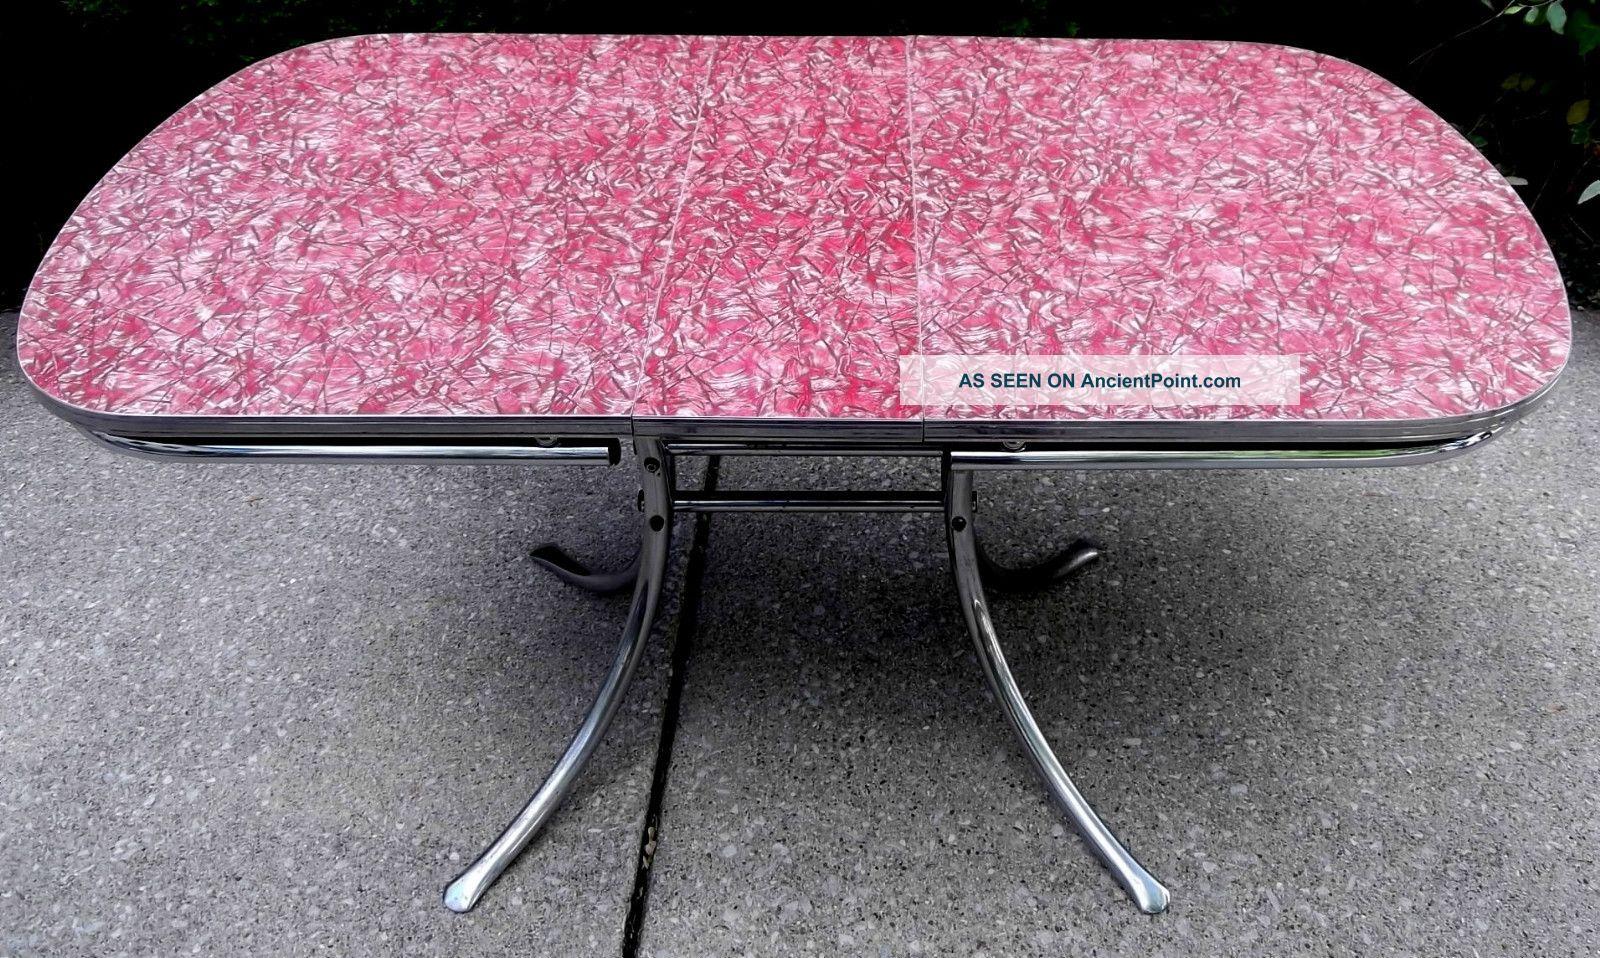 retro kitchen table set retro kitchen table sets Retro kitchen table set Photo 8